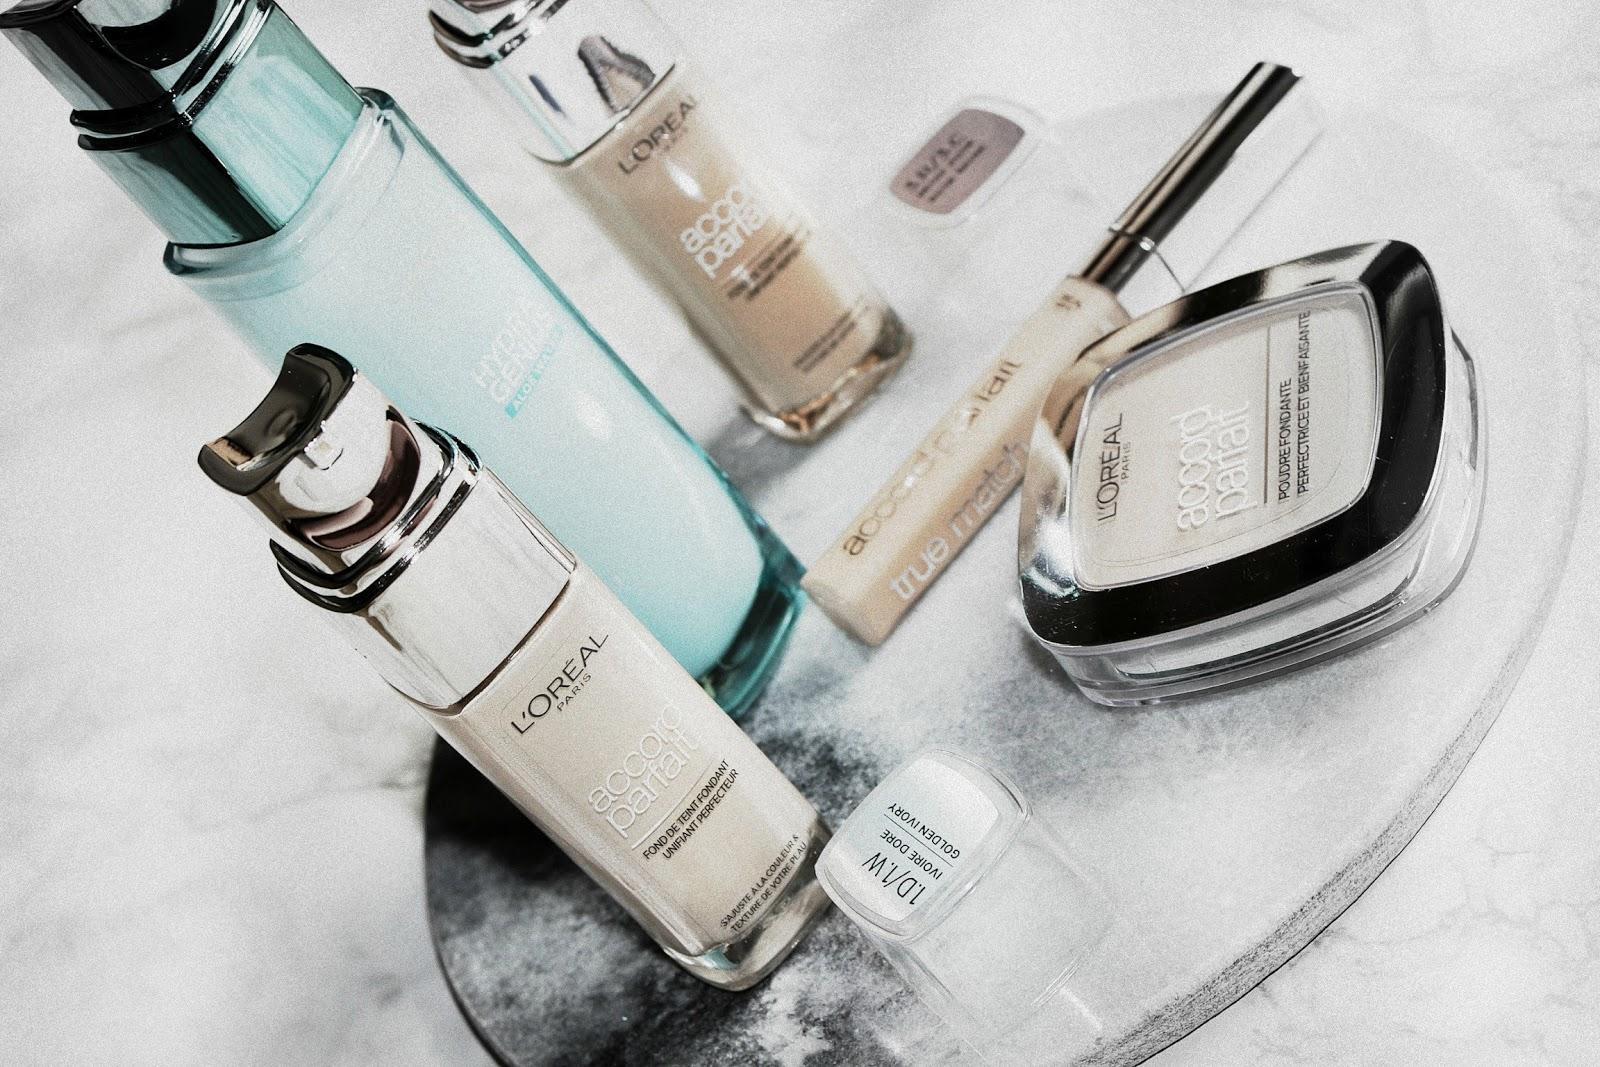 L'Oreal Accord Parfait Makeup